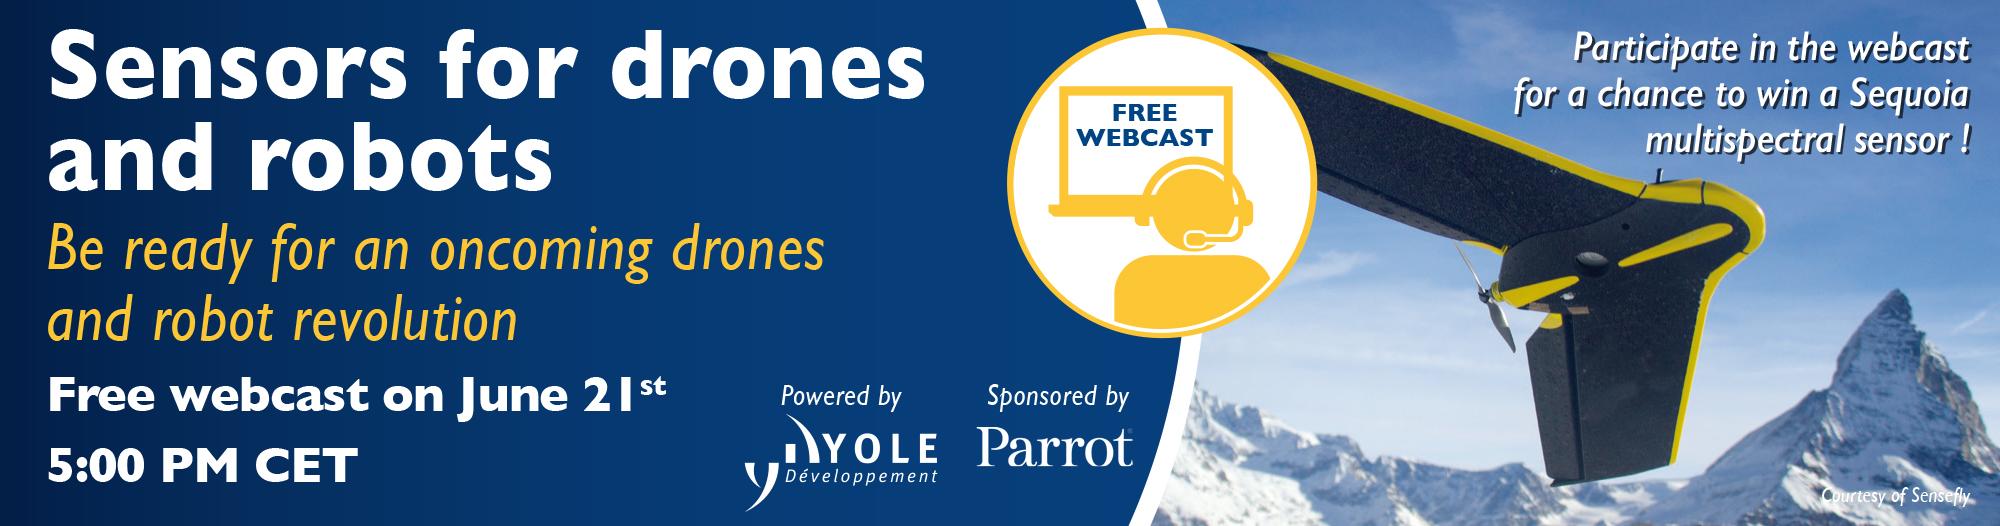 Webcast sensors for drones and robots - Yole Developpement